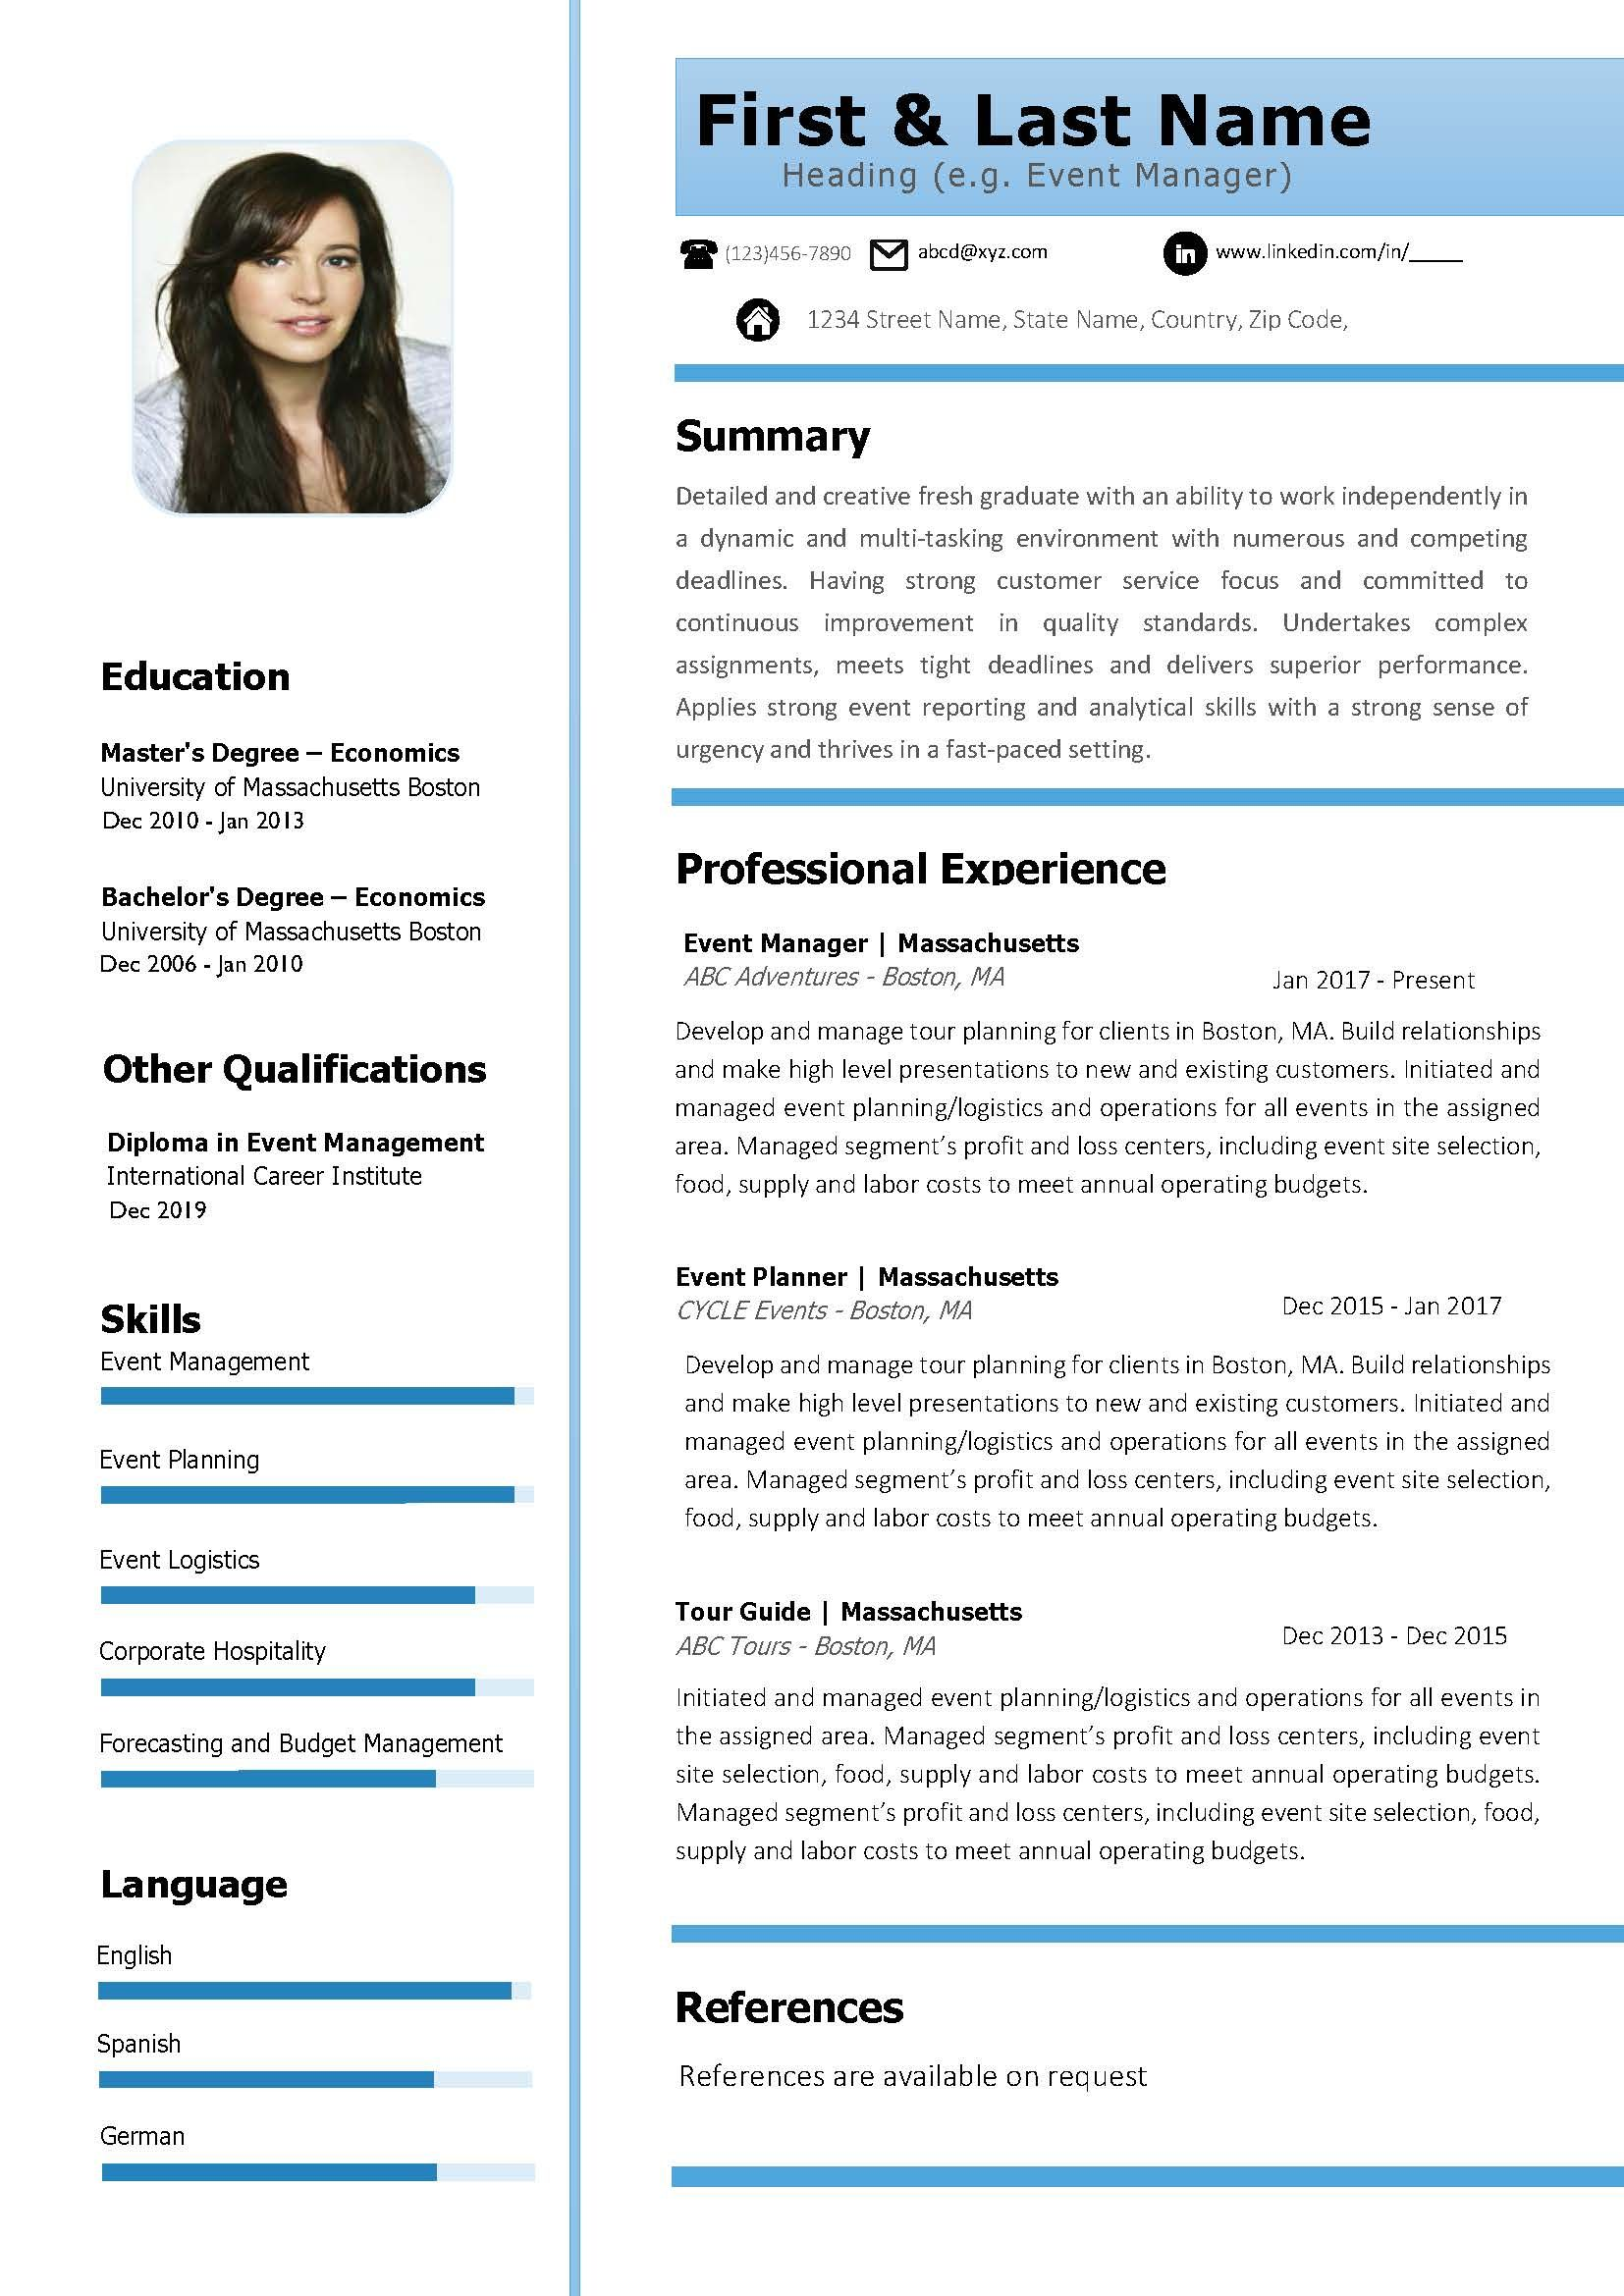 karar45 I will build or modify resume, cv, cover letter